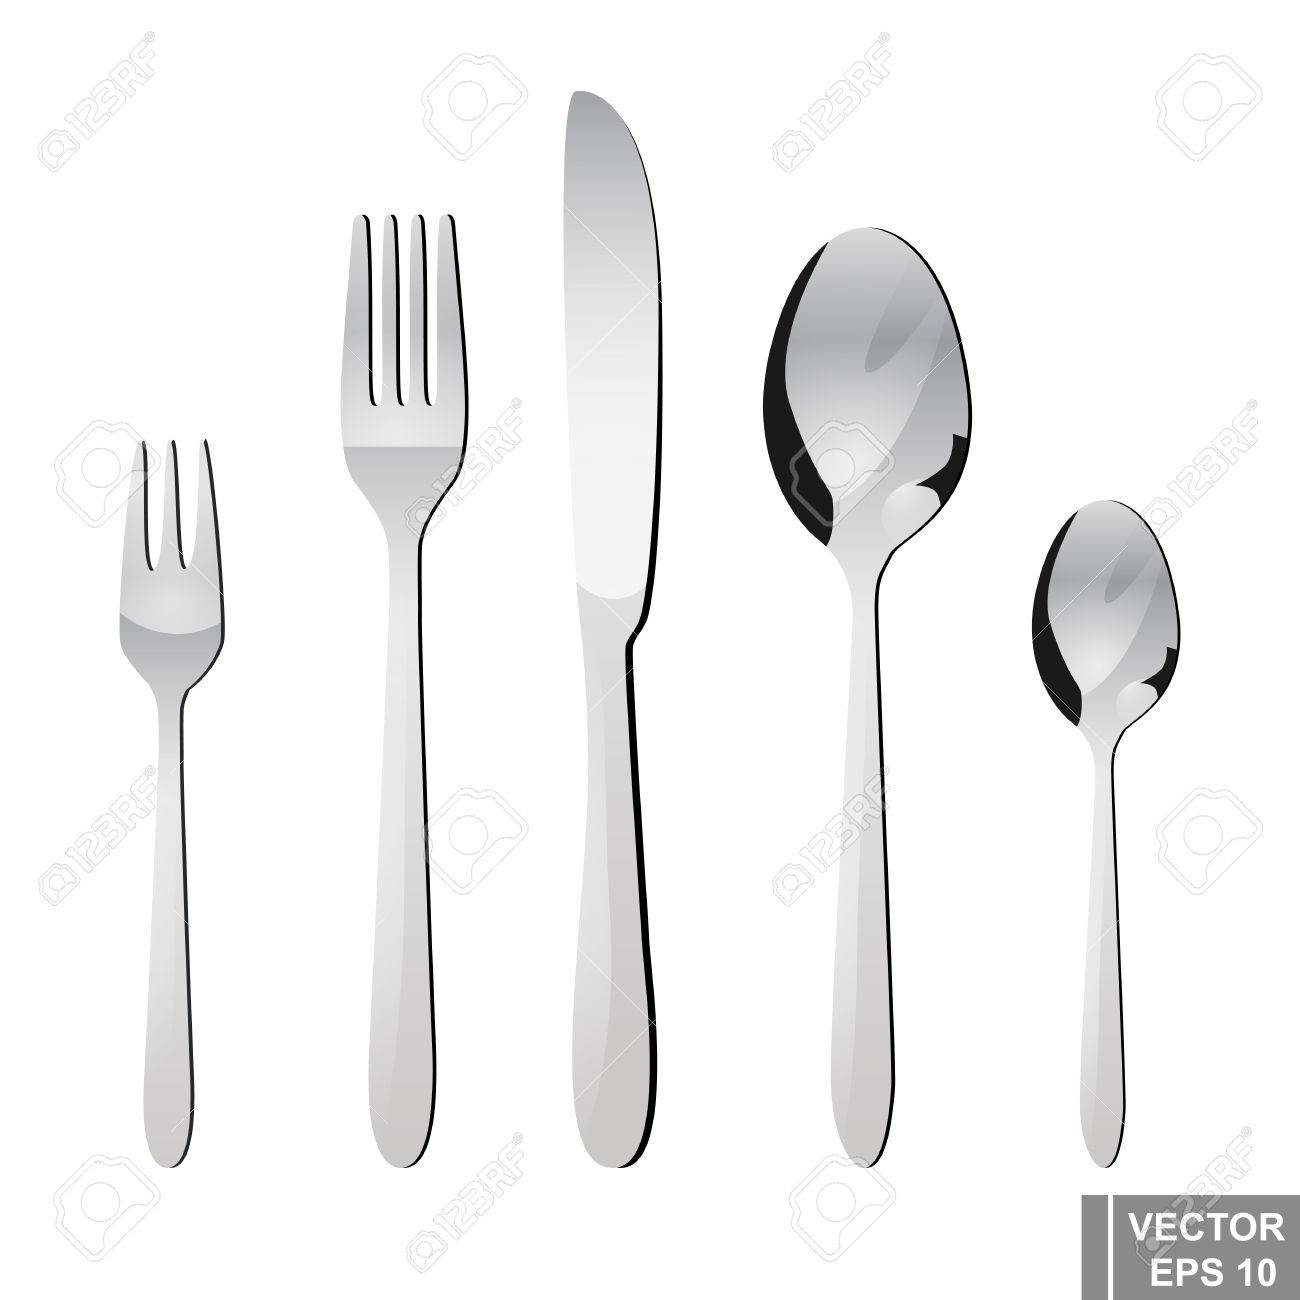 Cutlery Spoon Fork Knife Serving Preparing For Dinner Royalty